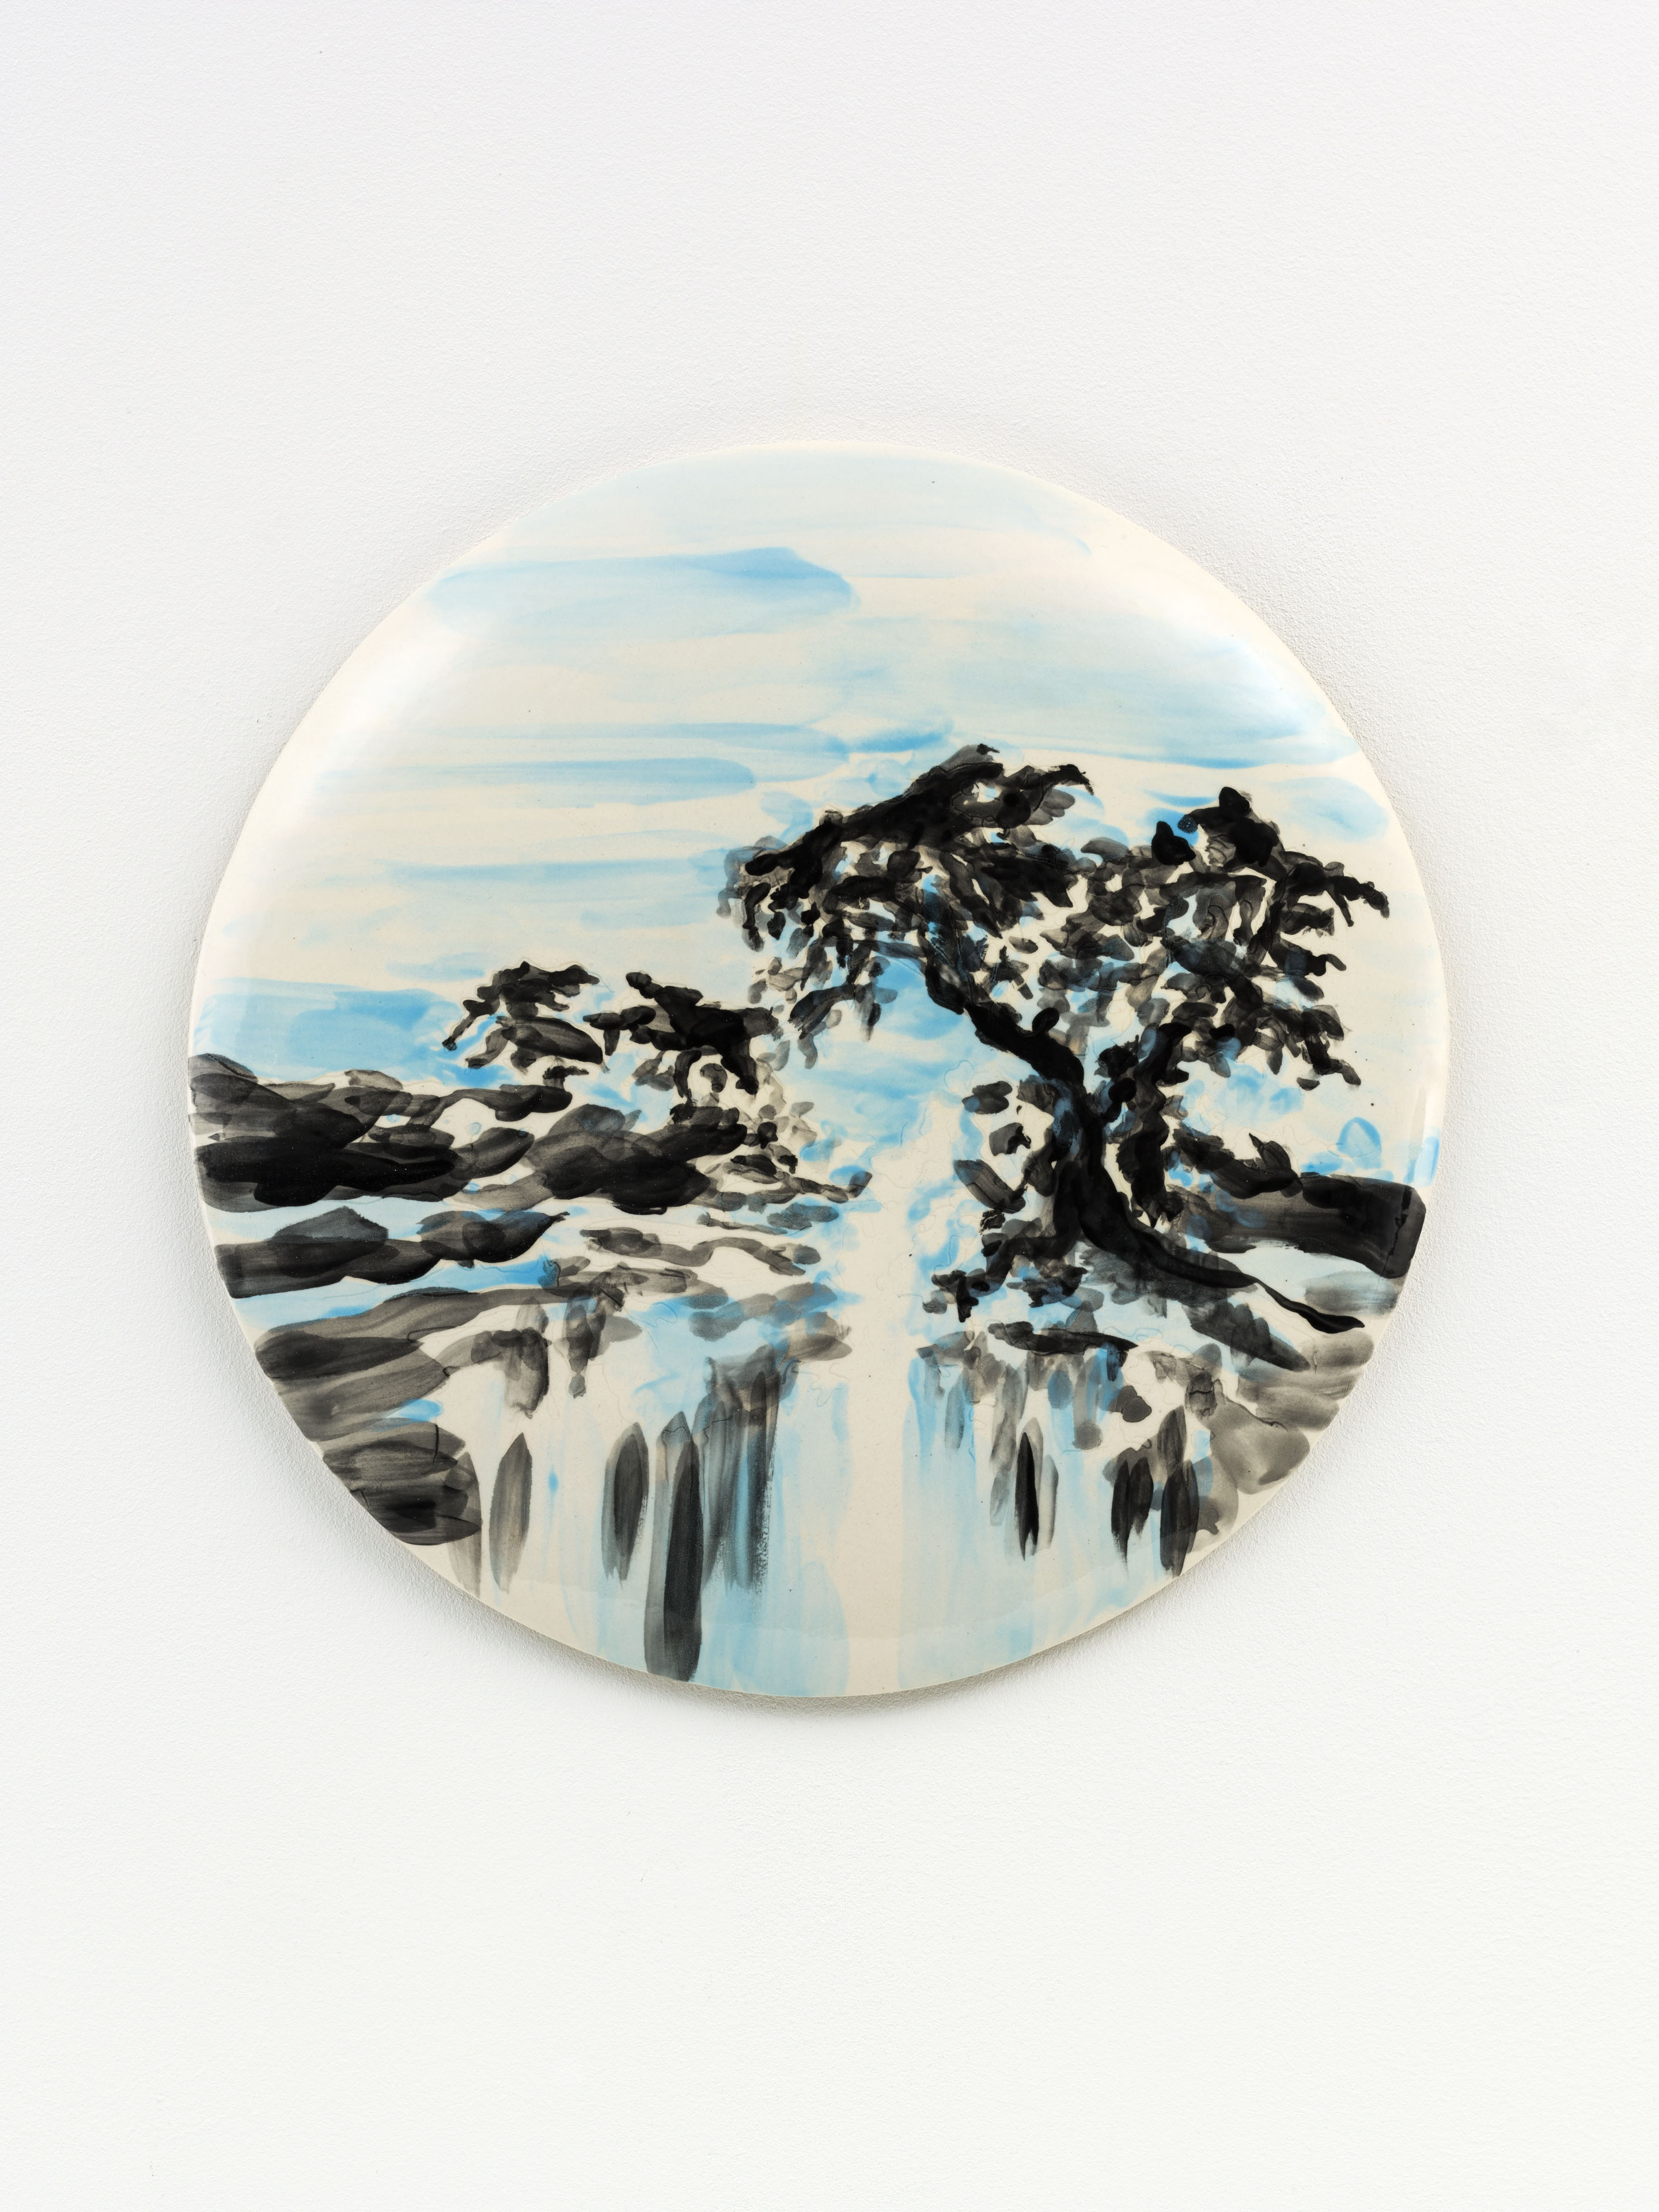 """O fim de Verao"" 33 x 33 cm. painted ceramic tile NL 2015"